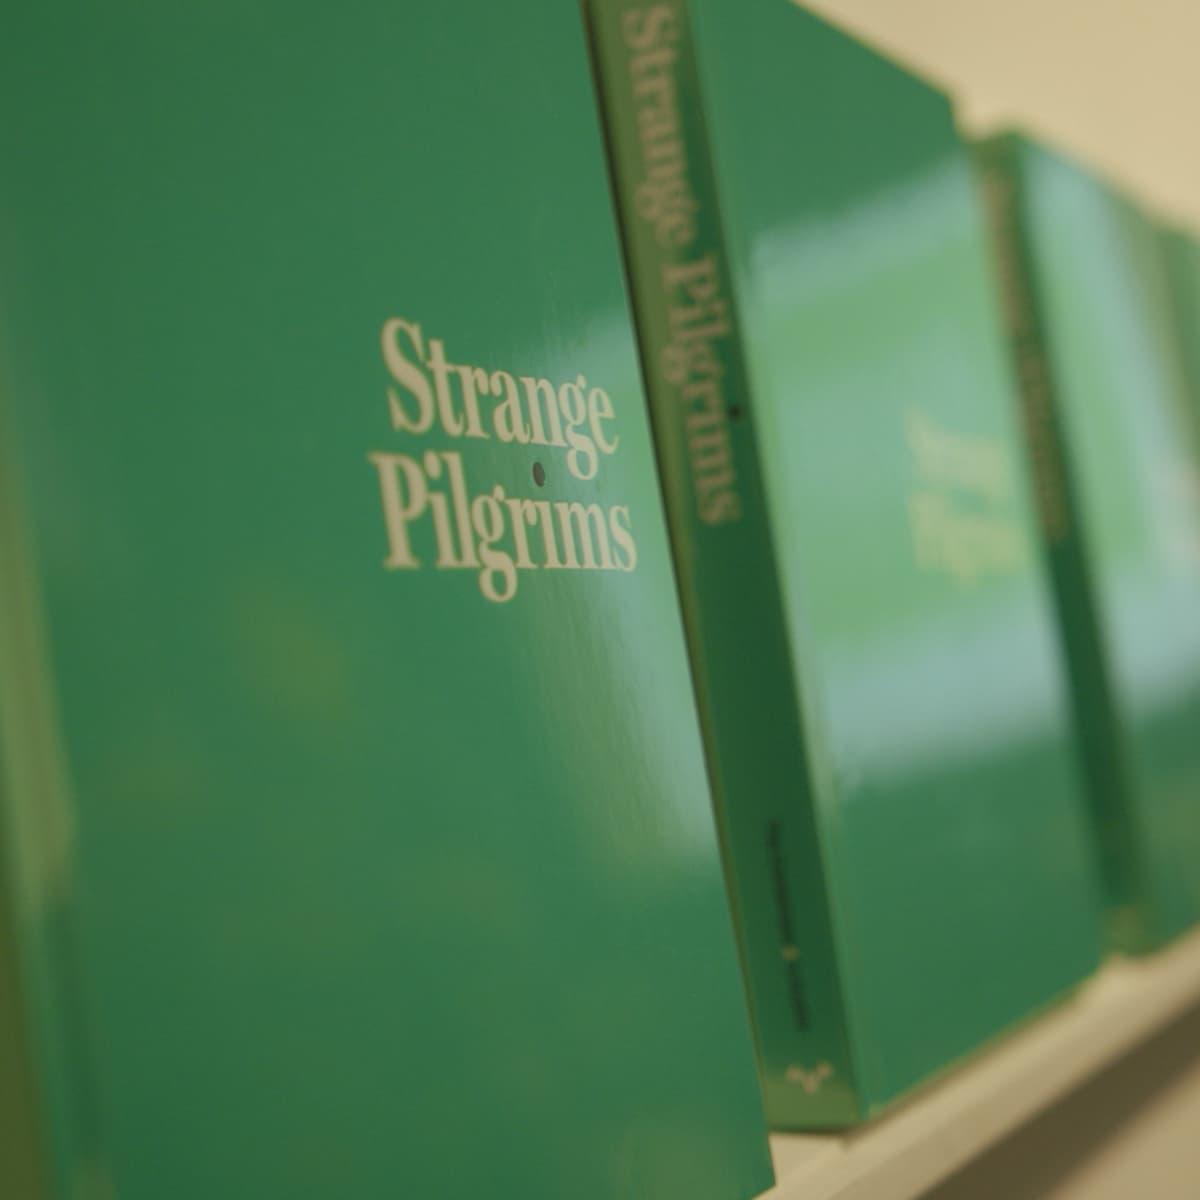 KLRU PBS Arts in Context Strange Pilgrims Contemporary Austin Gabriel Garcia Marquez book catalogue